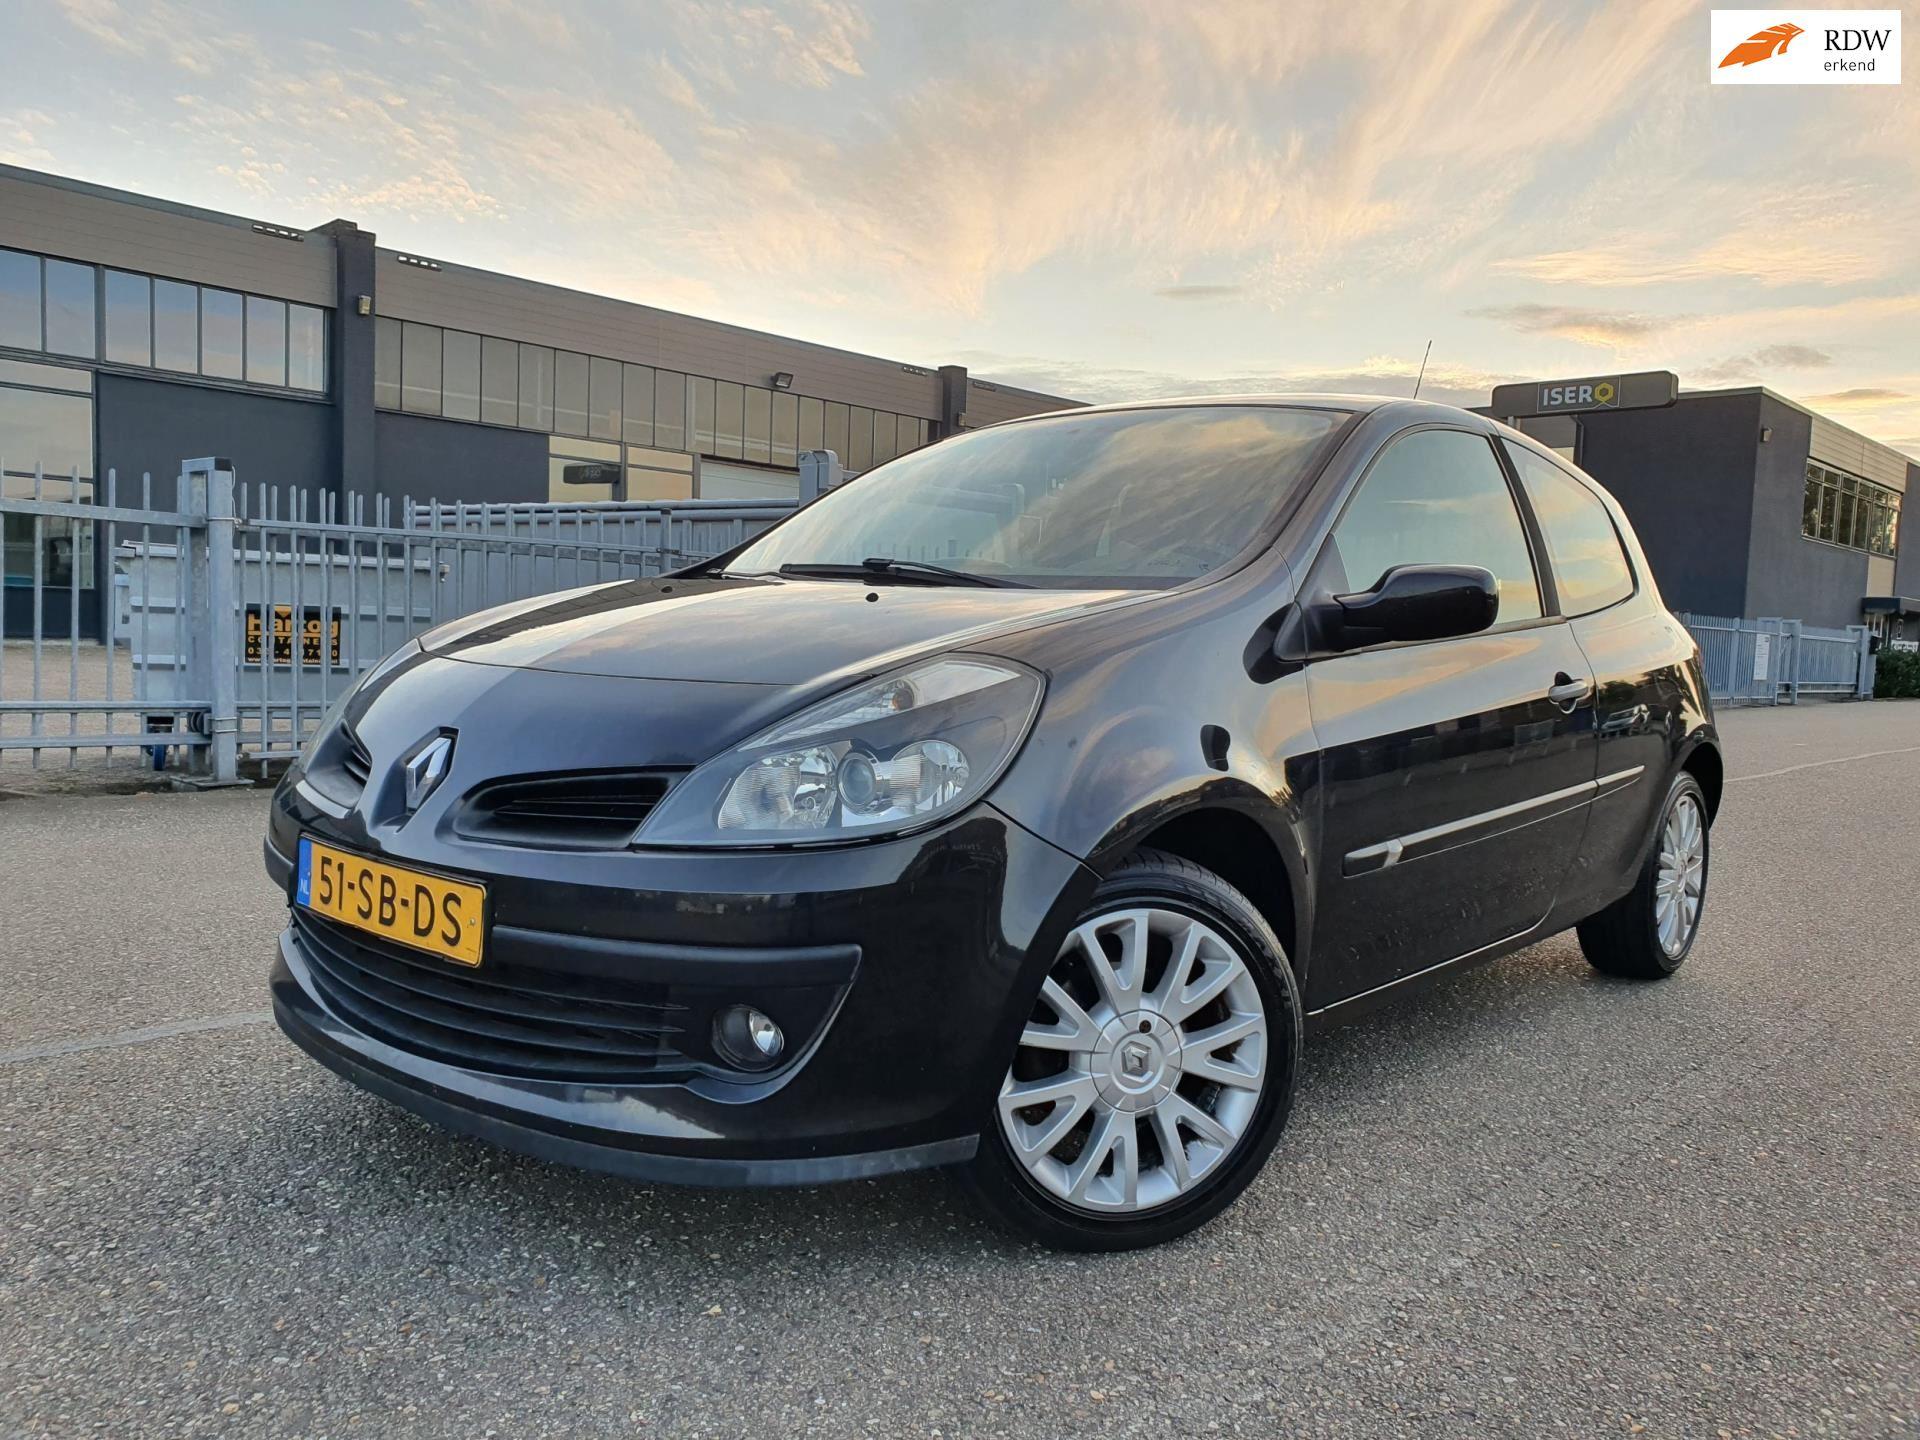 Renault Clio occasion - Autohandel Direct